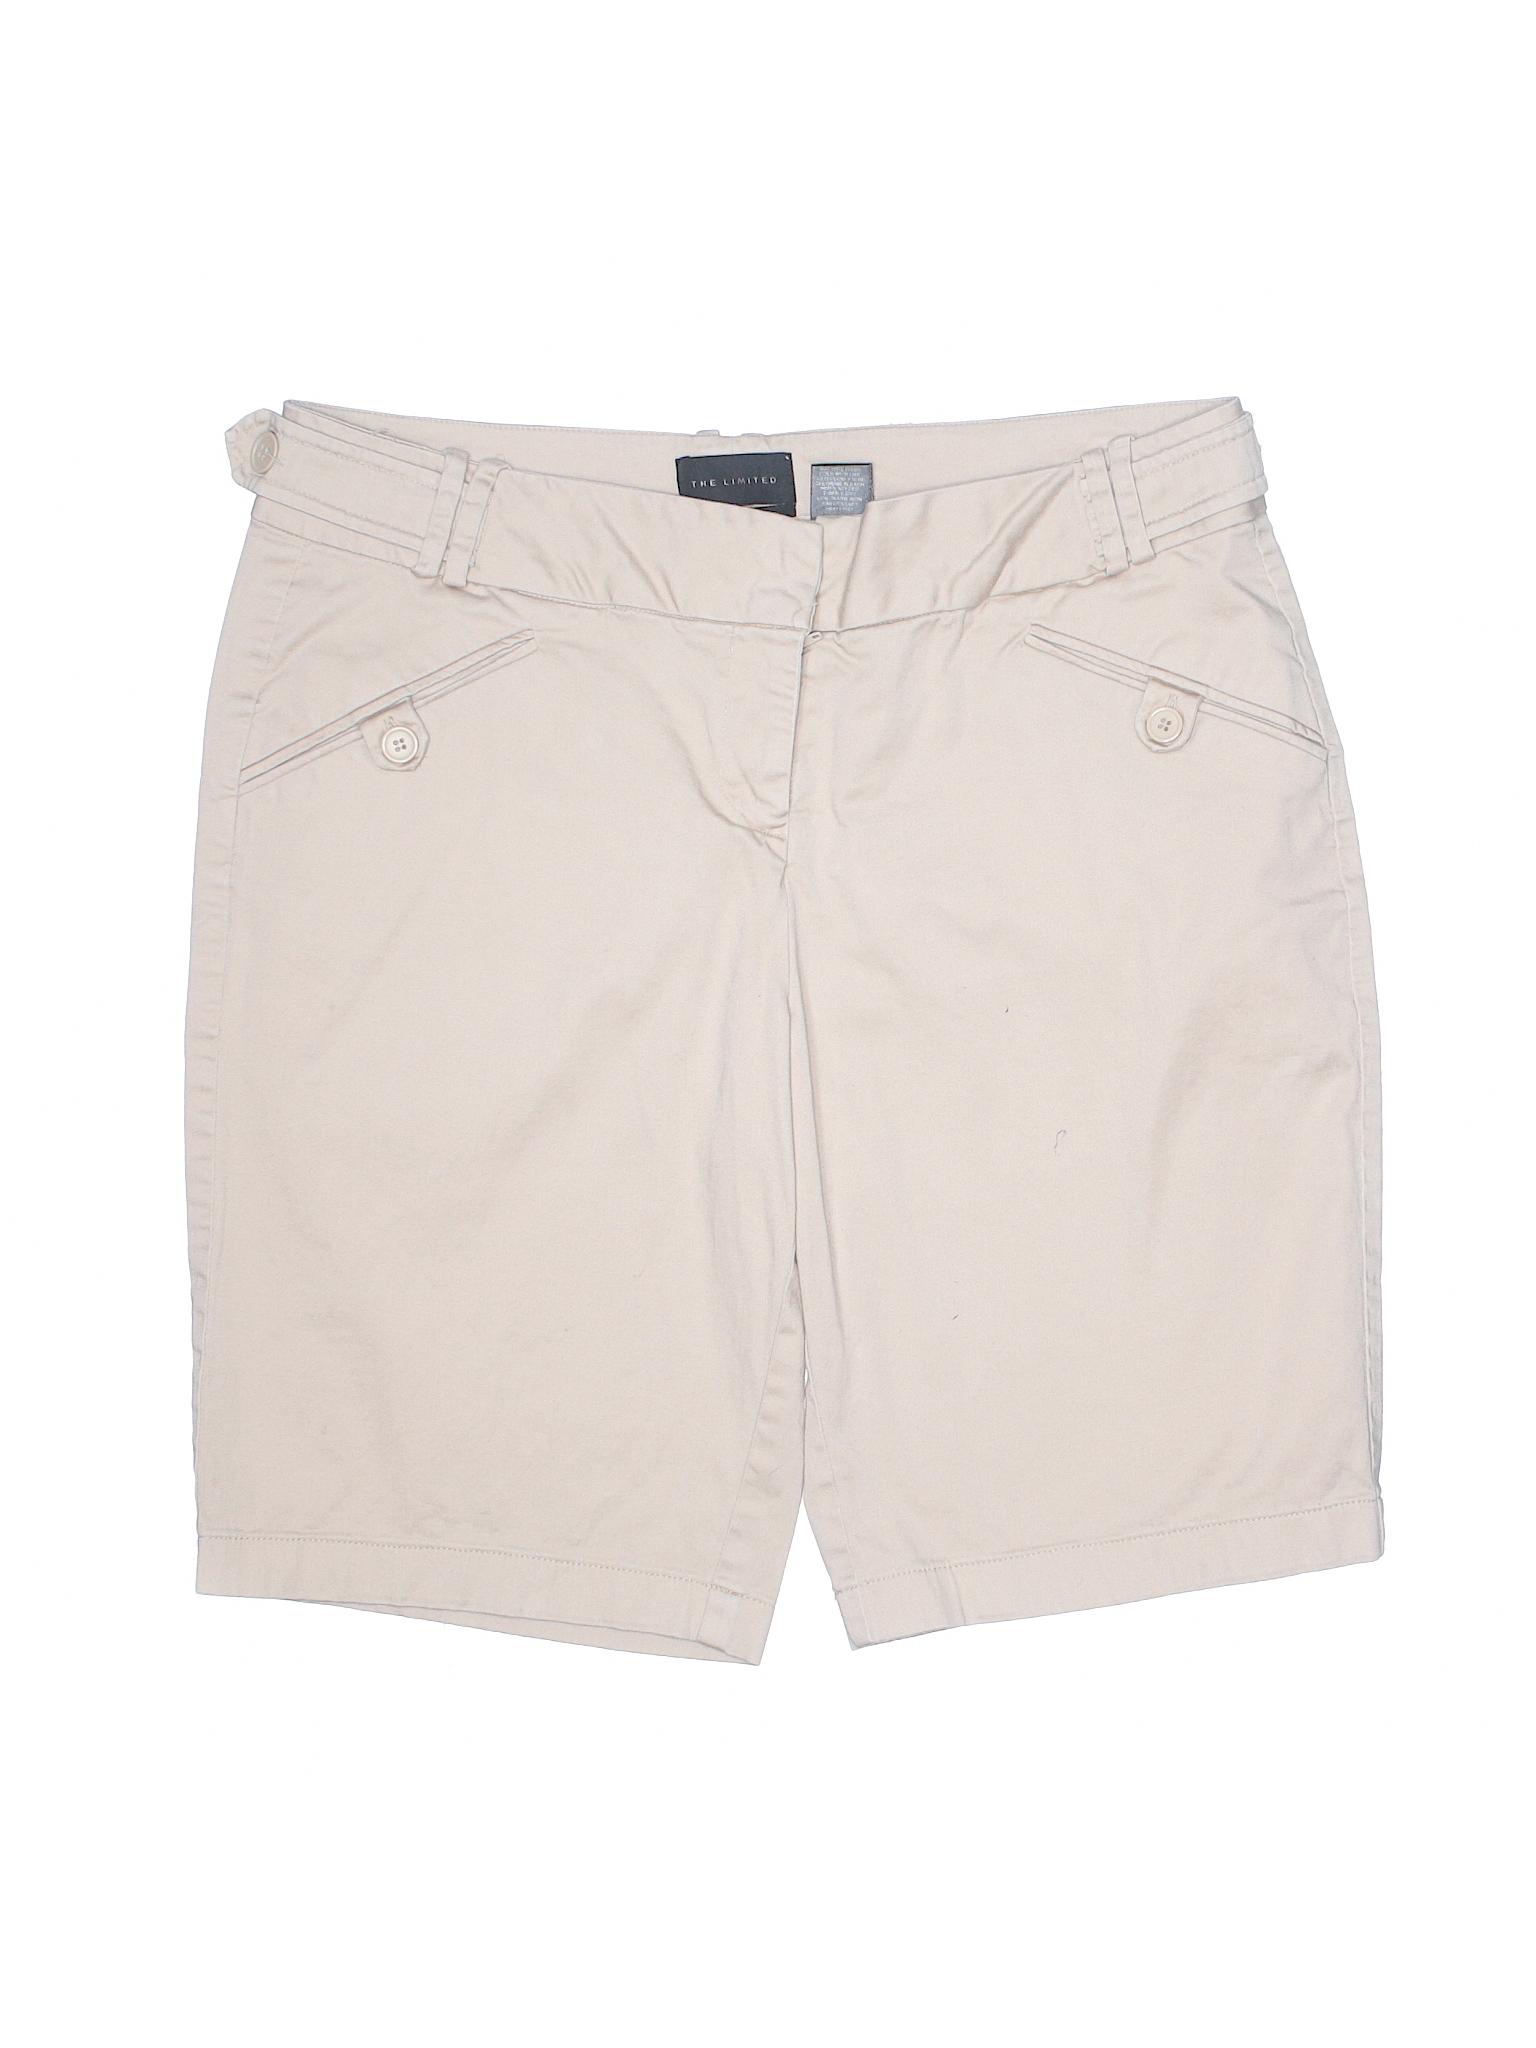 winter Shorts The Khaki Boutique Limited ASdzwdq